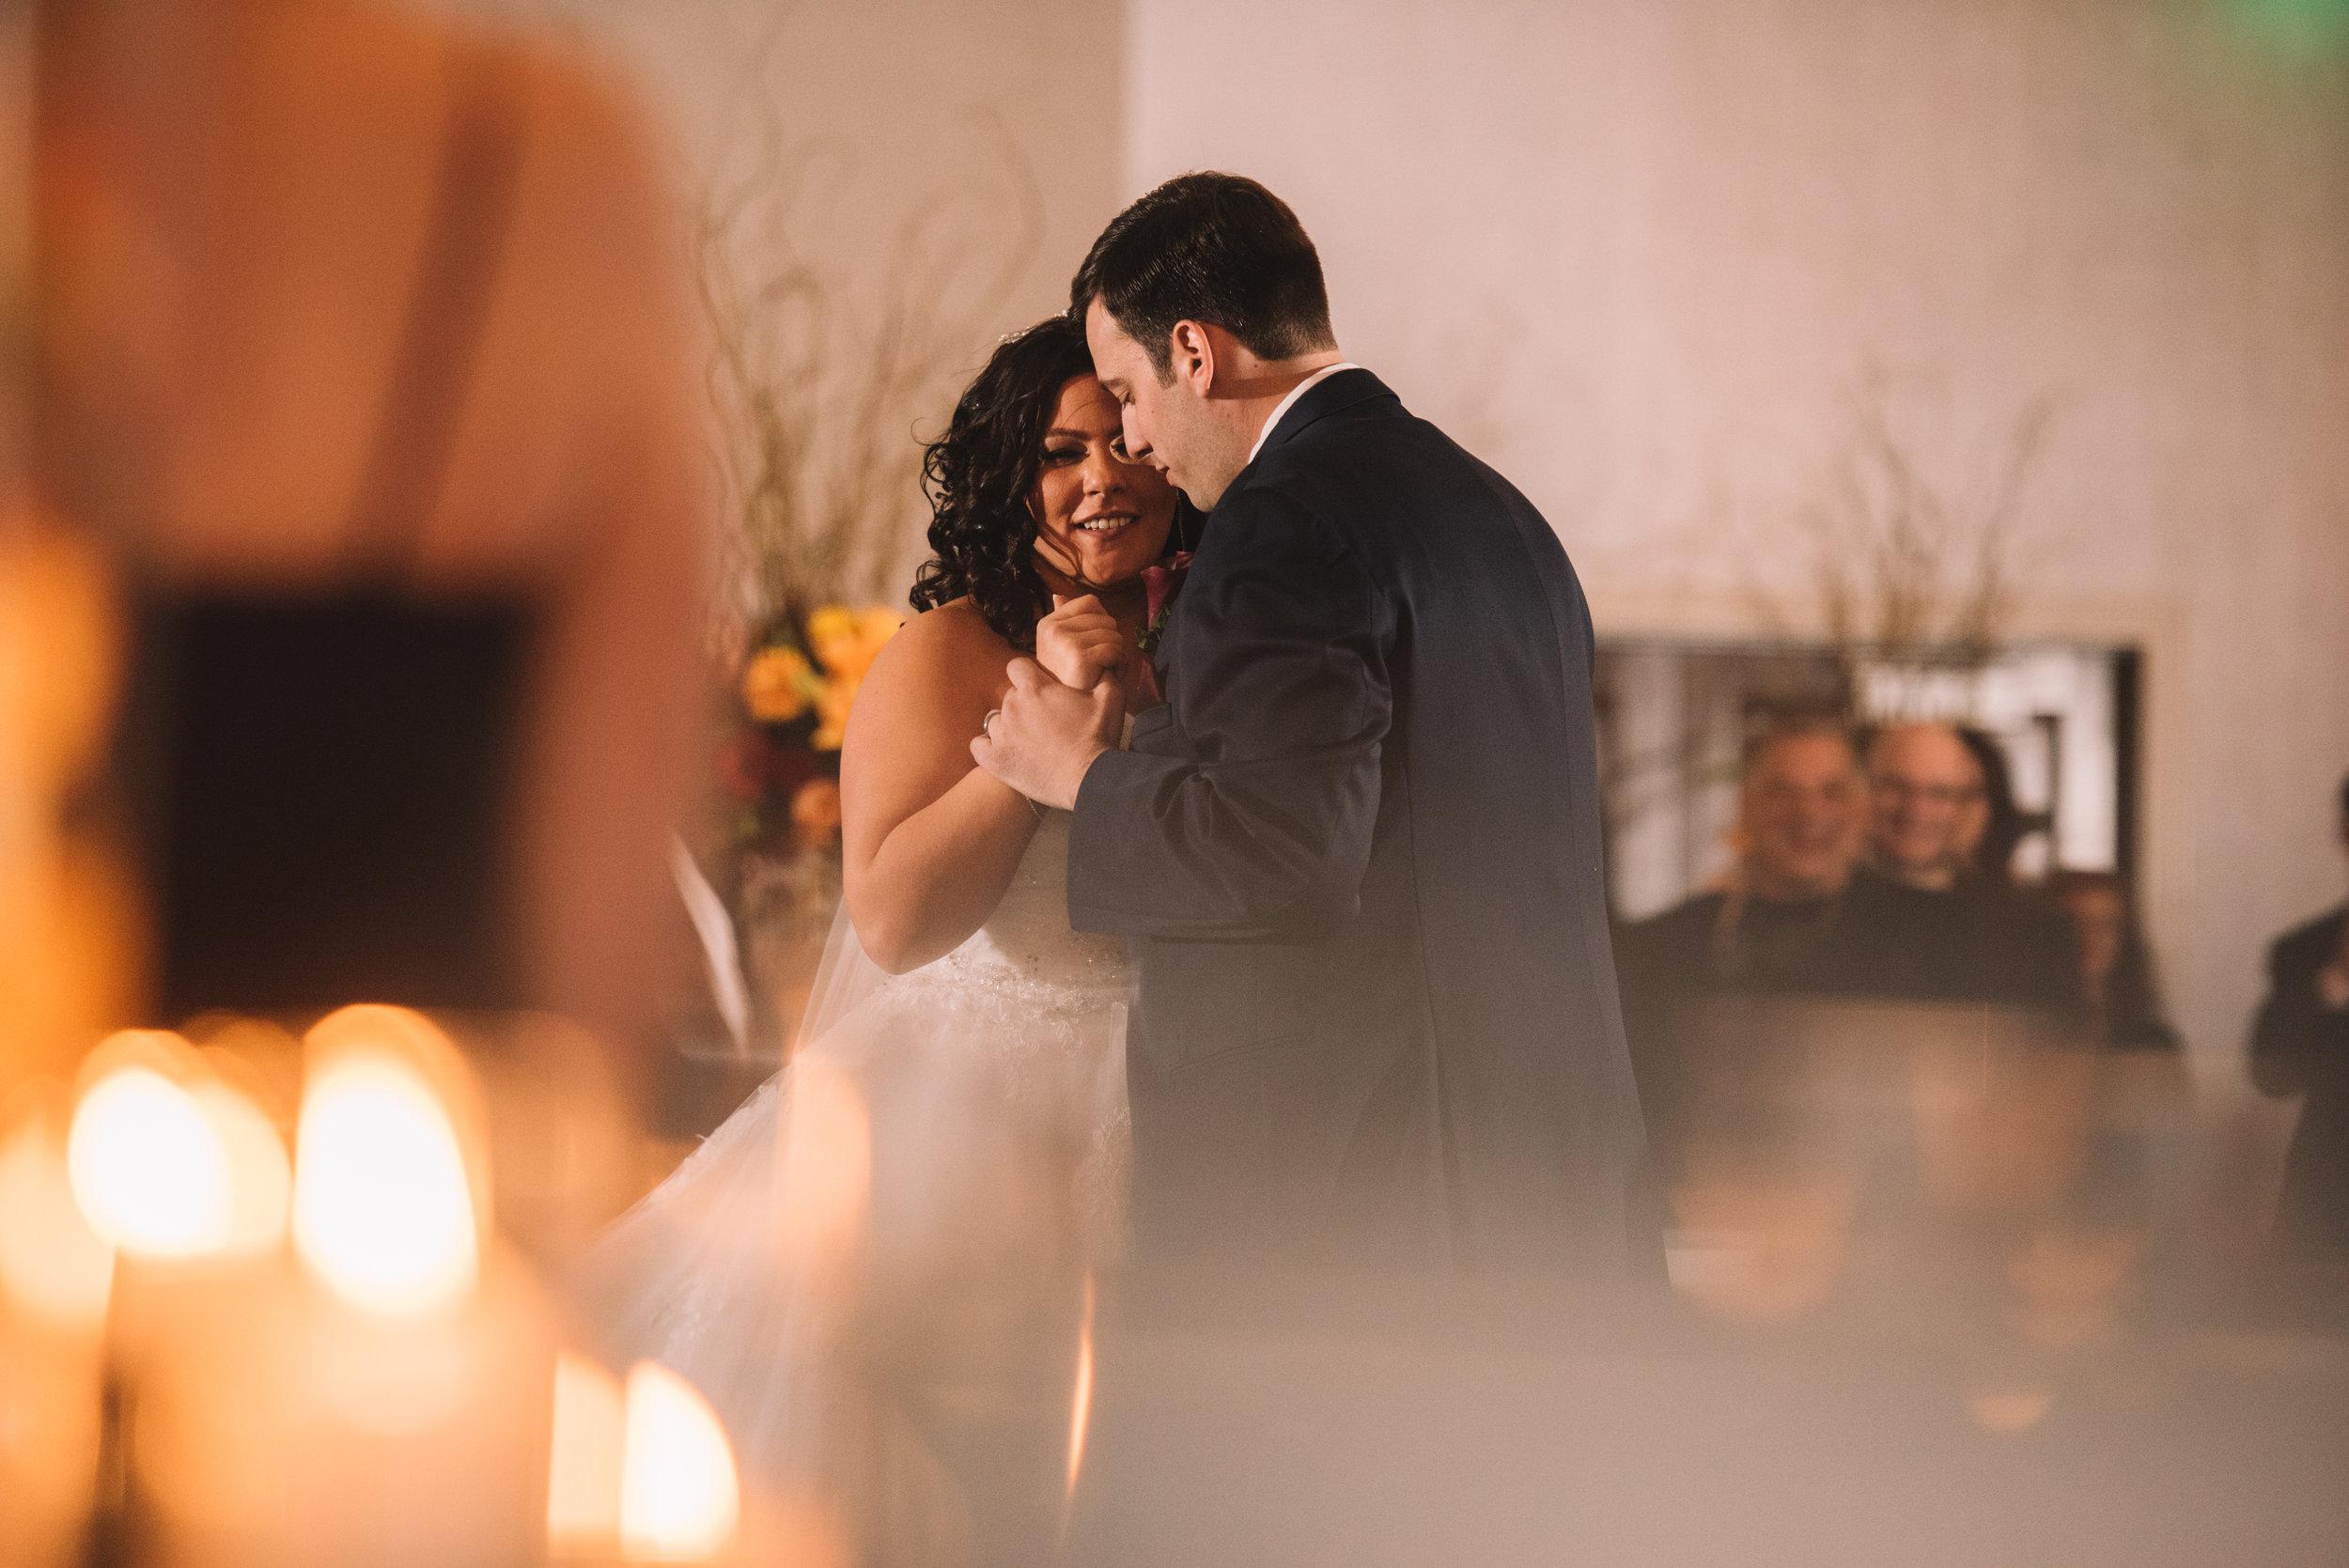 WeddingPhotos | NJPhotographer | Highlights-5-36.jpg